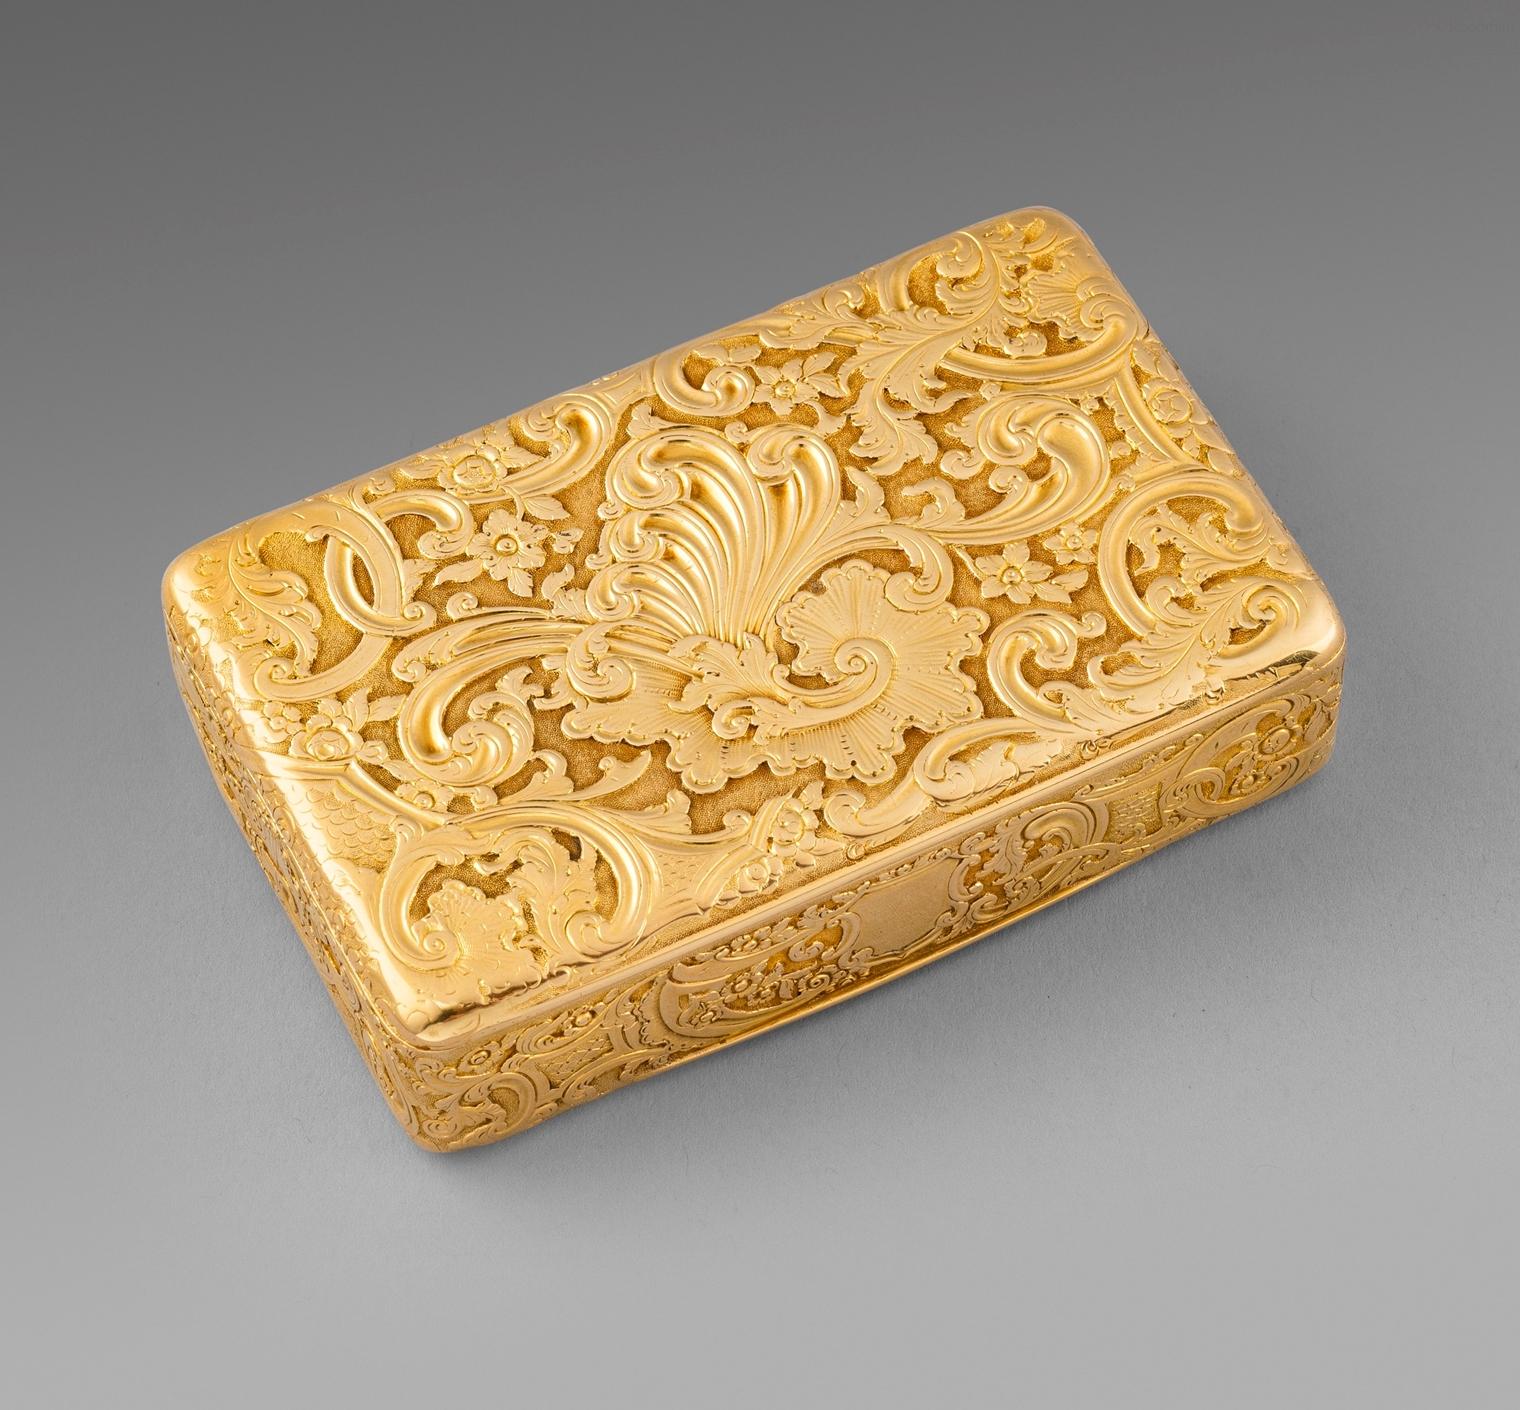 A Victorian Gold Snuff Box